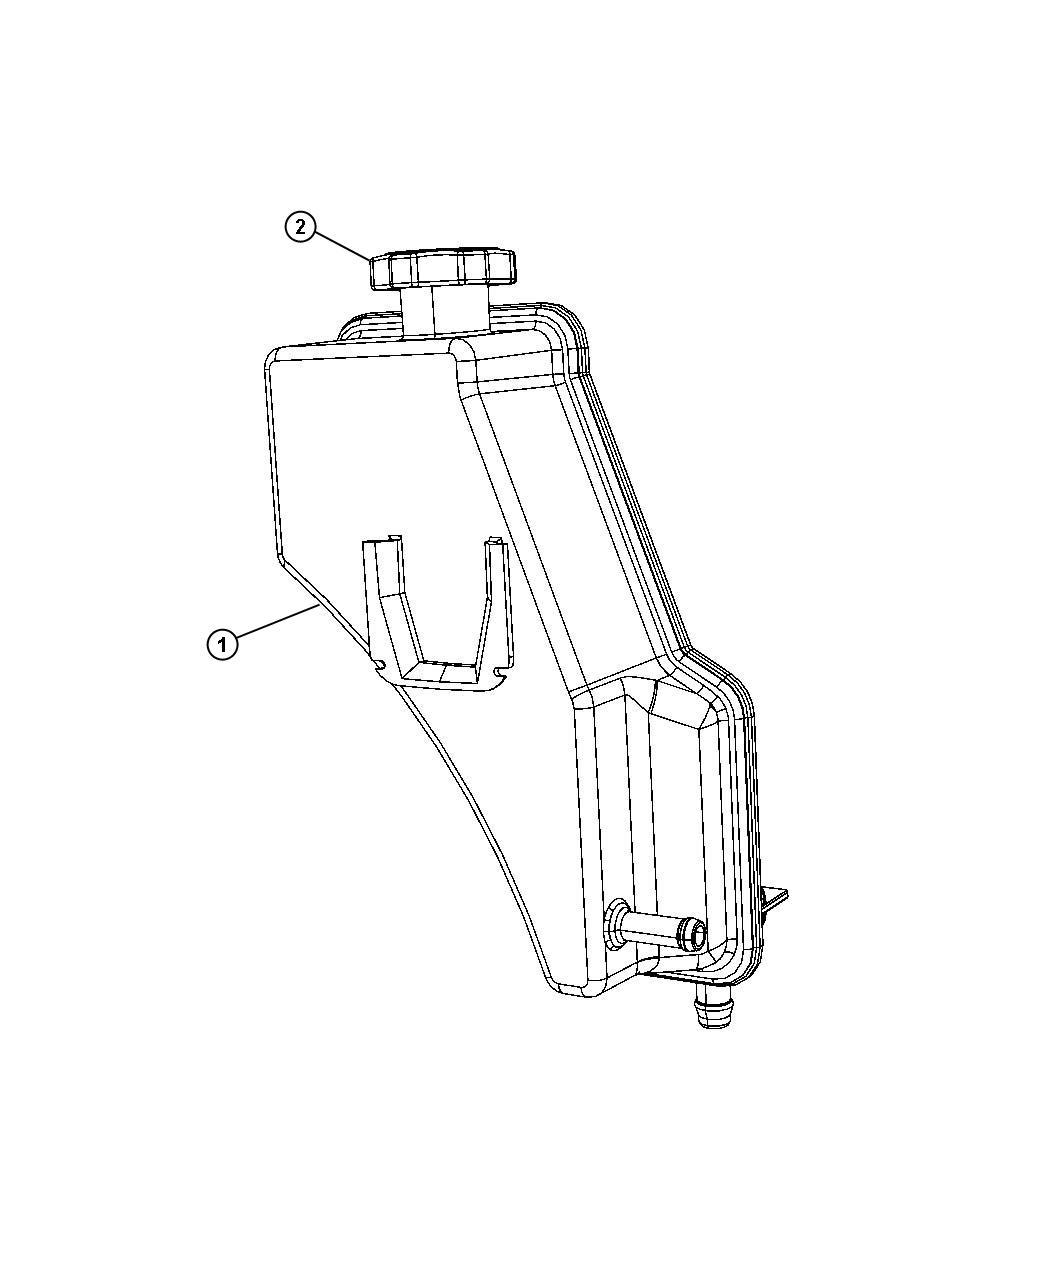 Jeep Commander Reservoir Power Steering Fluid Hydraulic